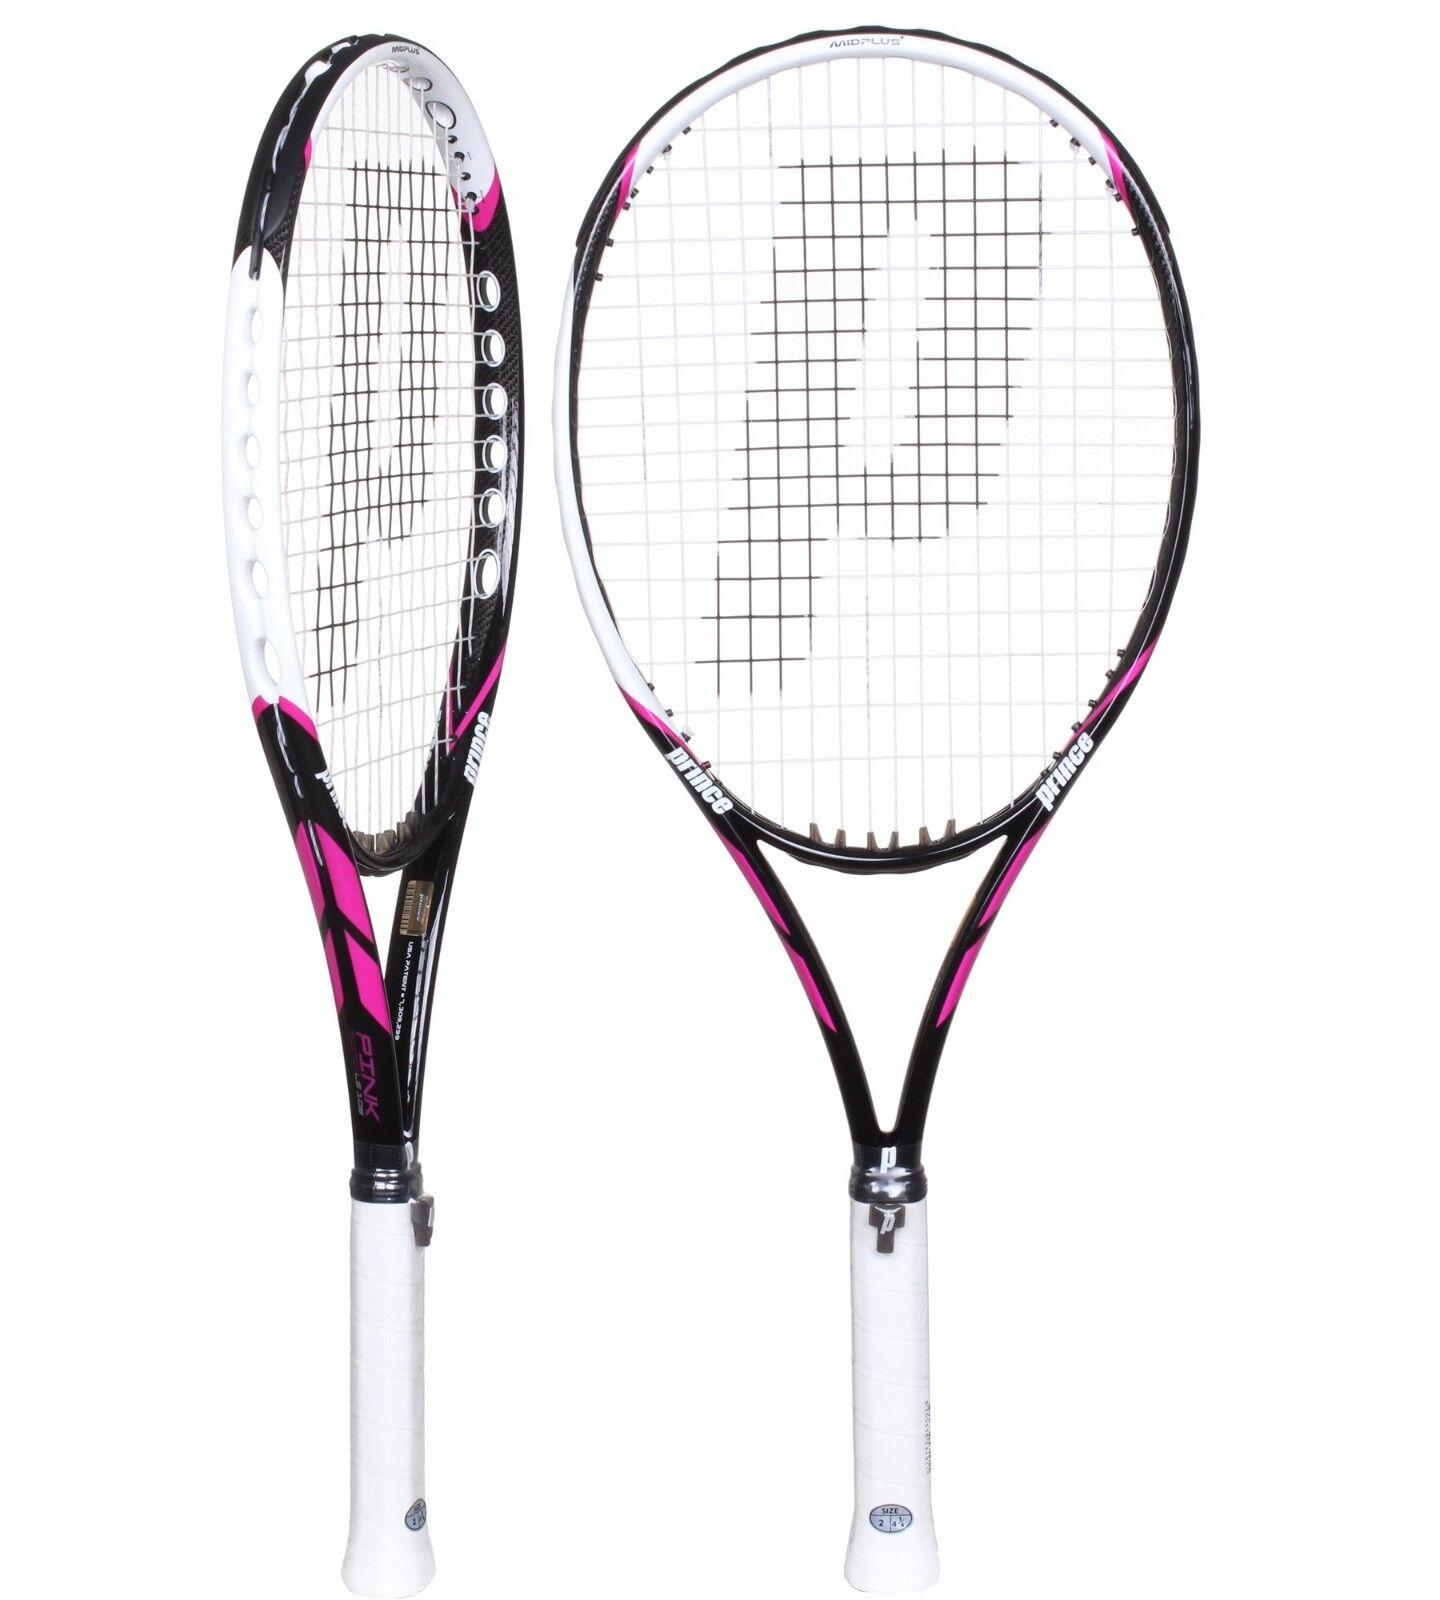 PRINCE 7T38J3051 - Raquette Tennis Pink LS 105 - Manche 4 1 8 - 1 NEUF